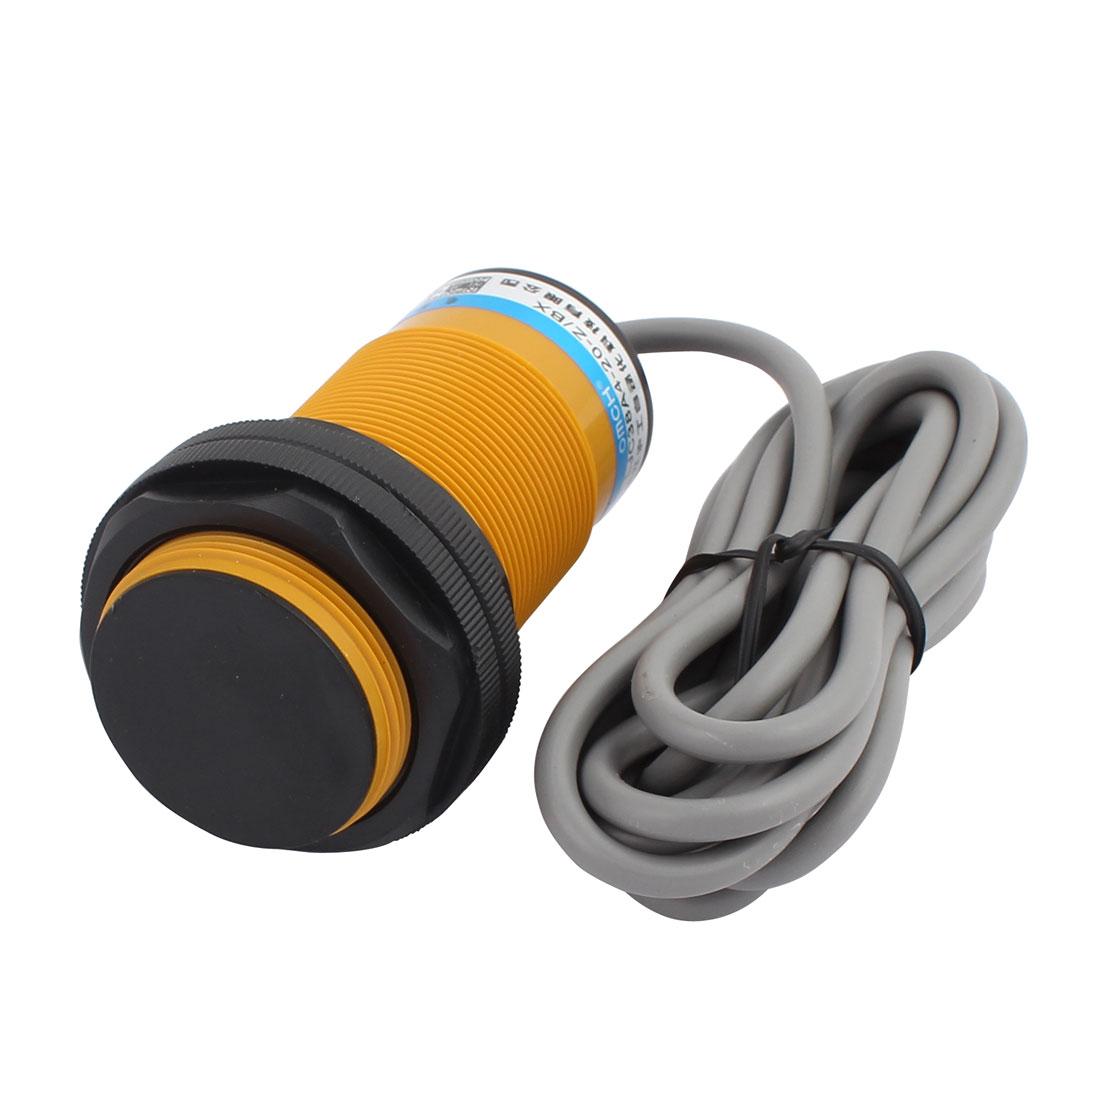 LJC38A4-20-Z/BX DC 6-36V 300mA NPN NO 20mm Inductive Proximity Sensor Switch 3-wire